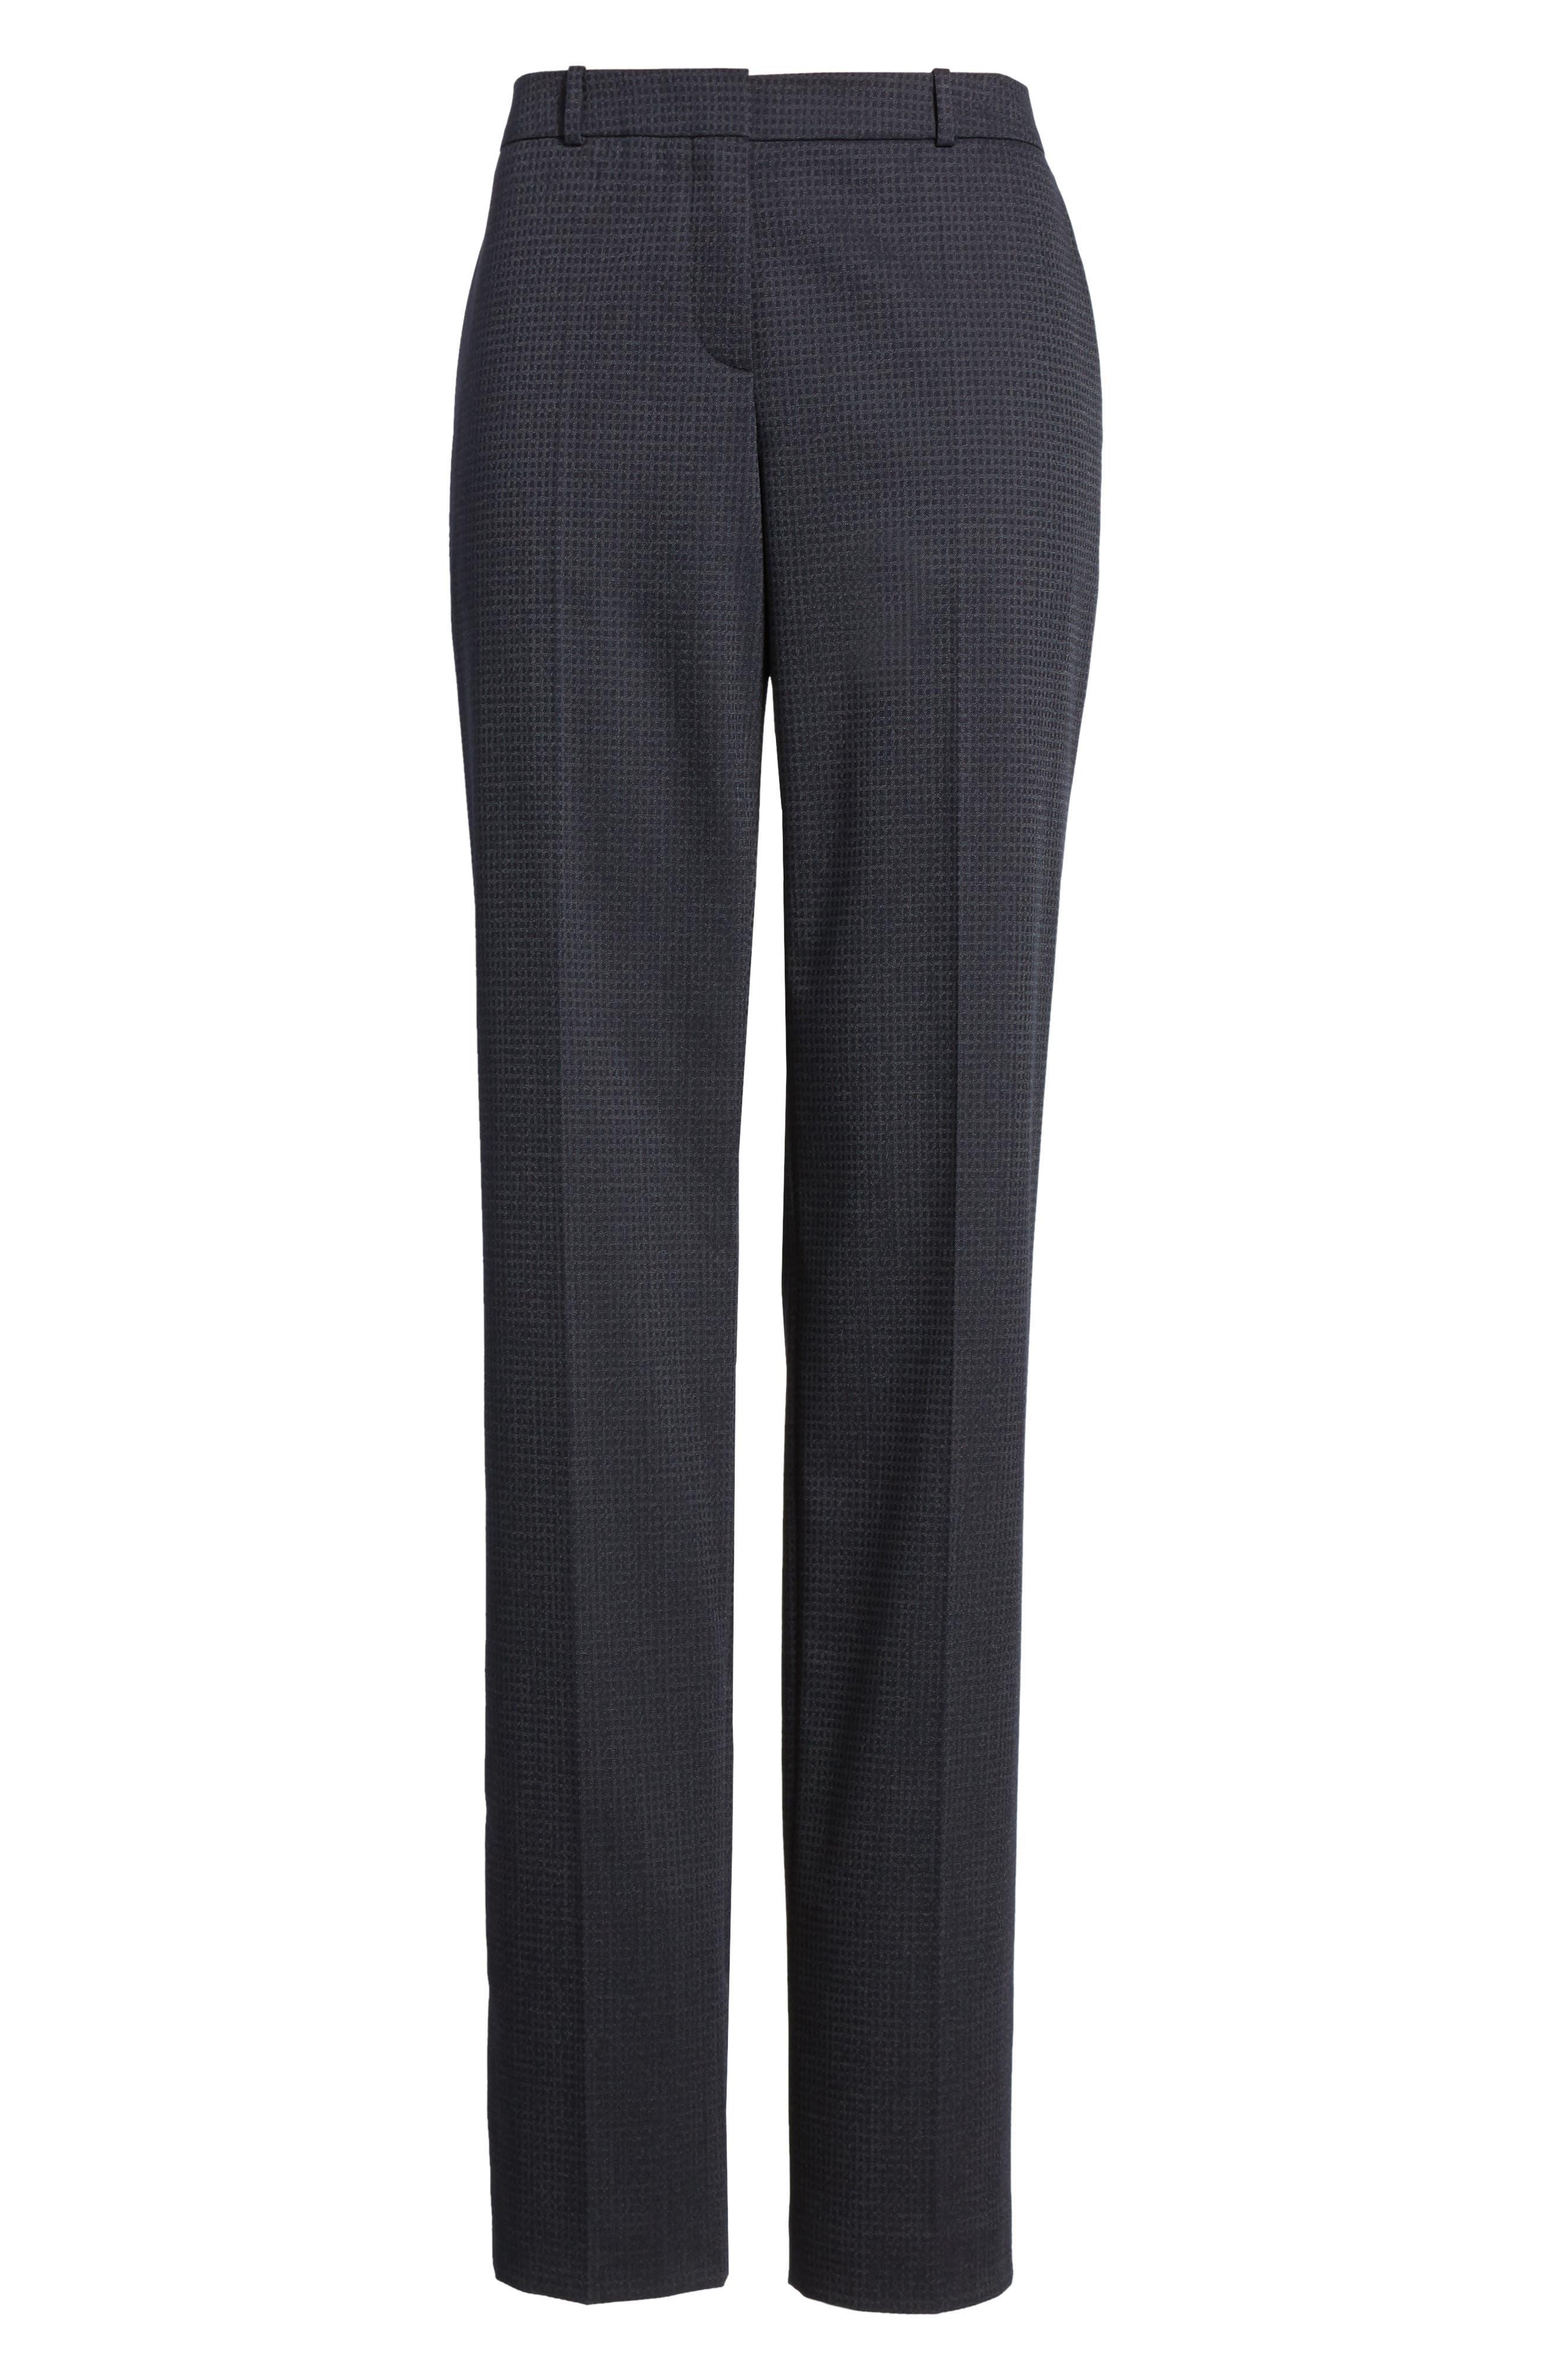 Tamea Stretch Wool Straight Leg Trousers,                             Alternate thumbnail 6, color,                             461